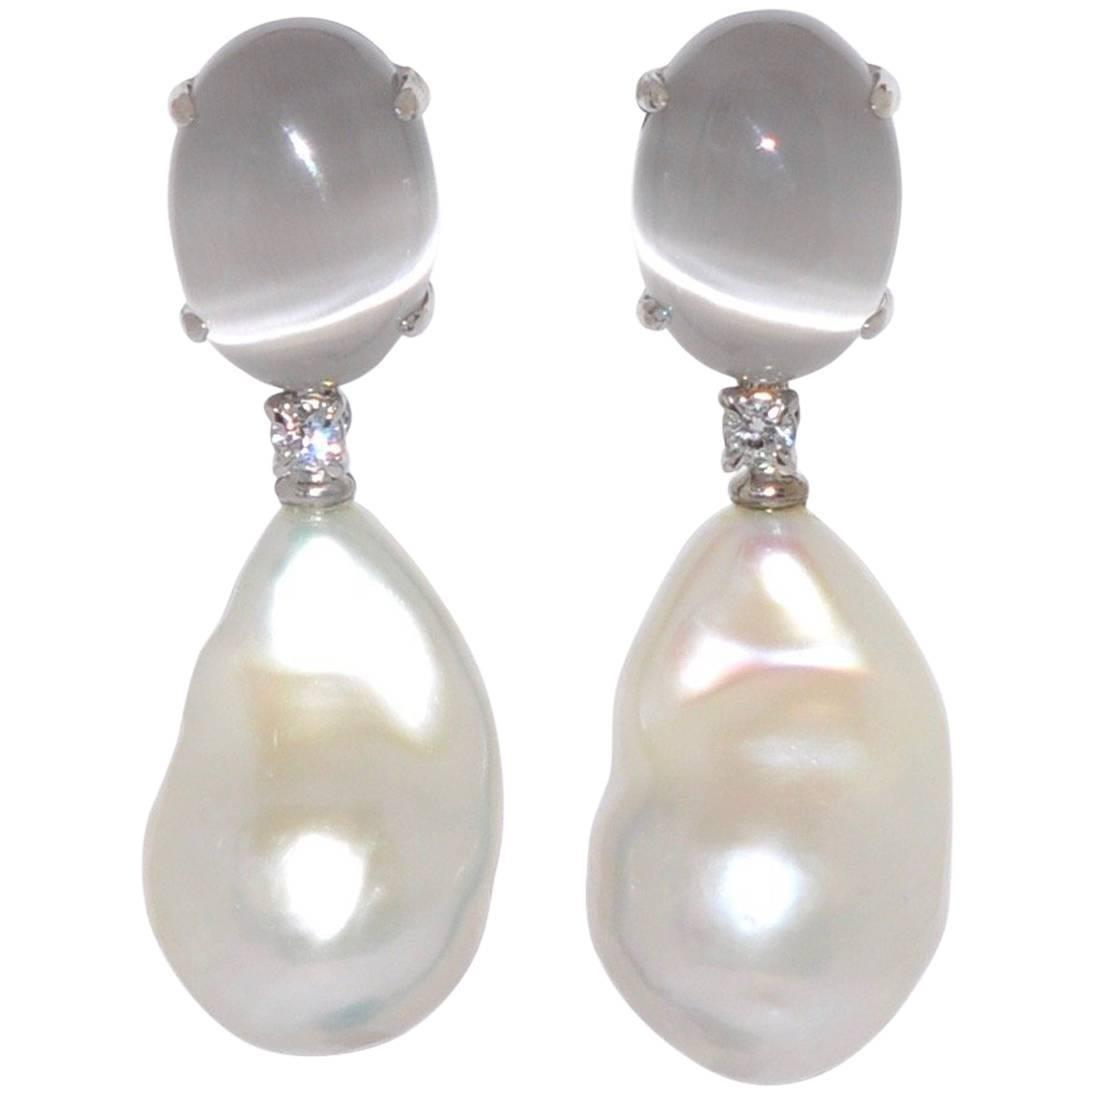 Freshwater Pearls, Quartz and White Diamonds on White Gold Chandelier Earrings